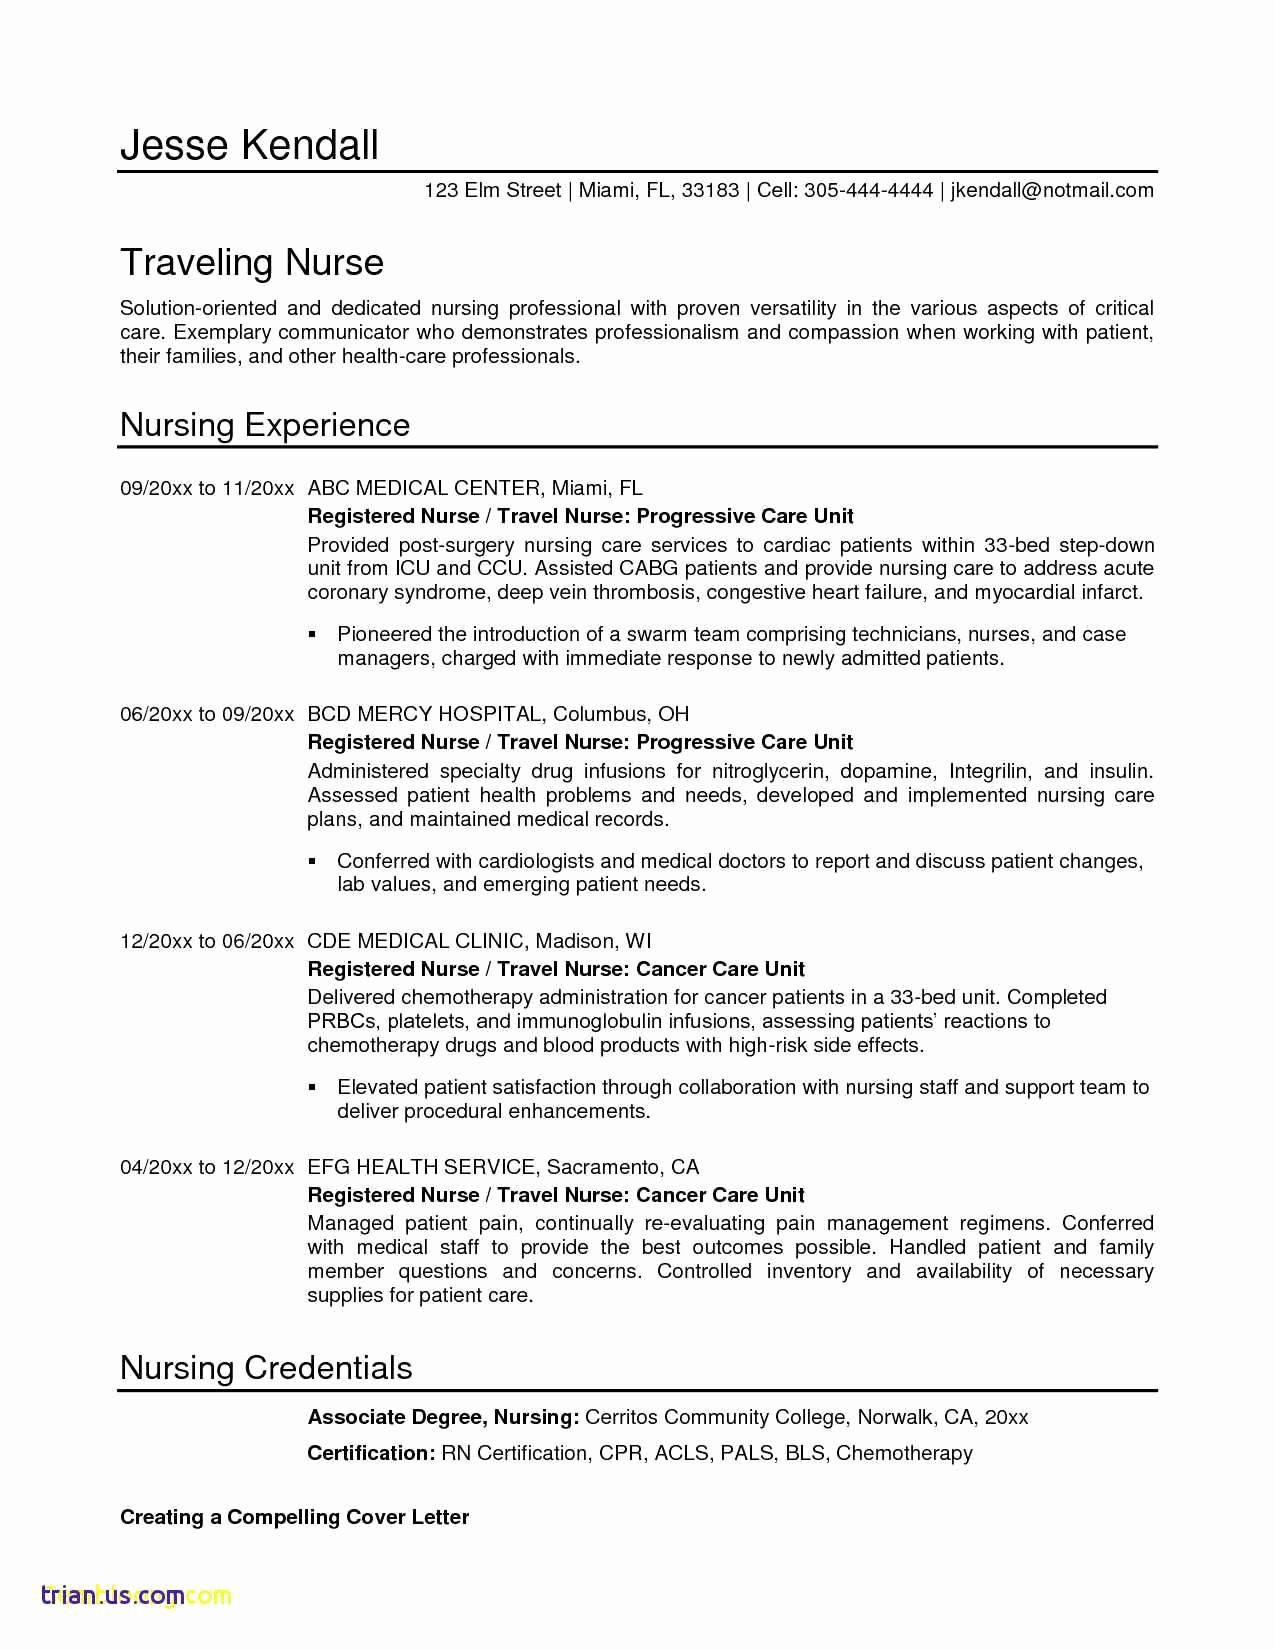 Registered Nurse Resume Template Word Unique Bestse Resume Template Rn Examples Free Registered Word